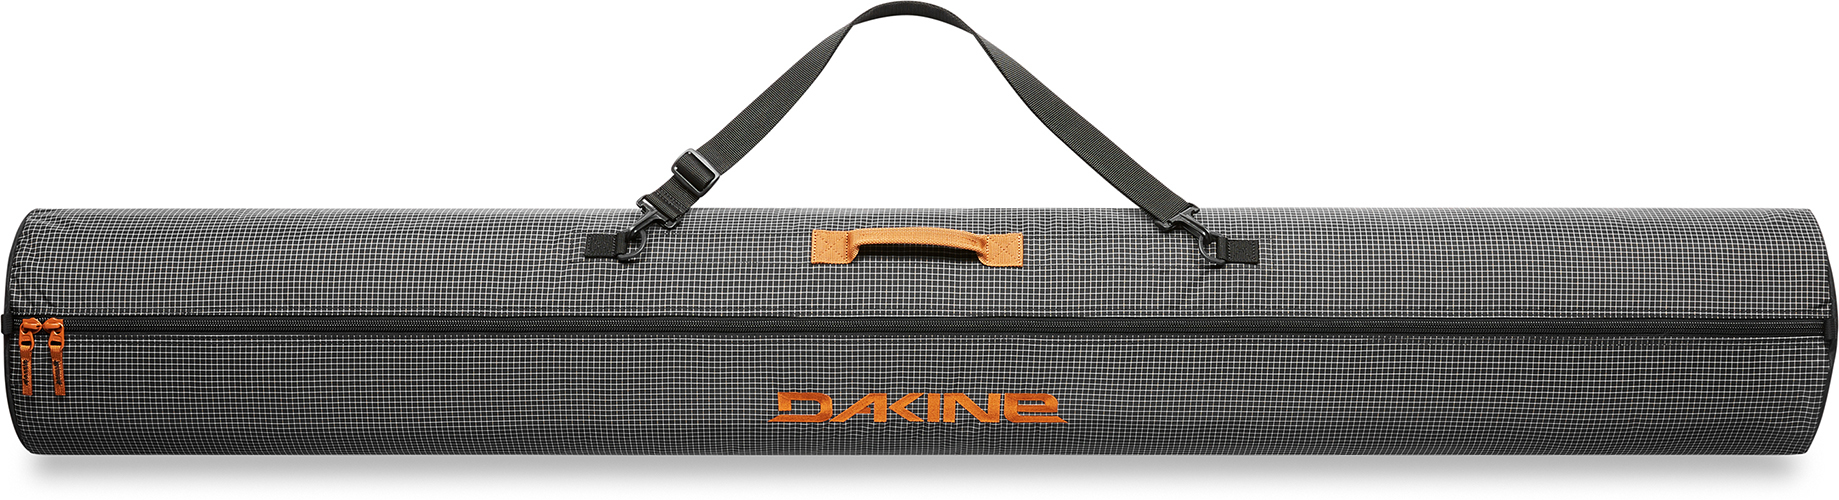 Dakine Padded Single Чехол для горных лыж Dakine PADDED SKI SLEEVE 190 RINCON SKISLEEVE-RINCON-610934247671_10001466_RINCON-91M_MAIN.jpg